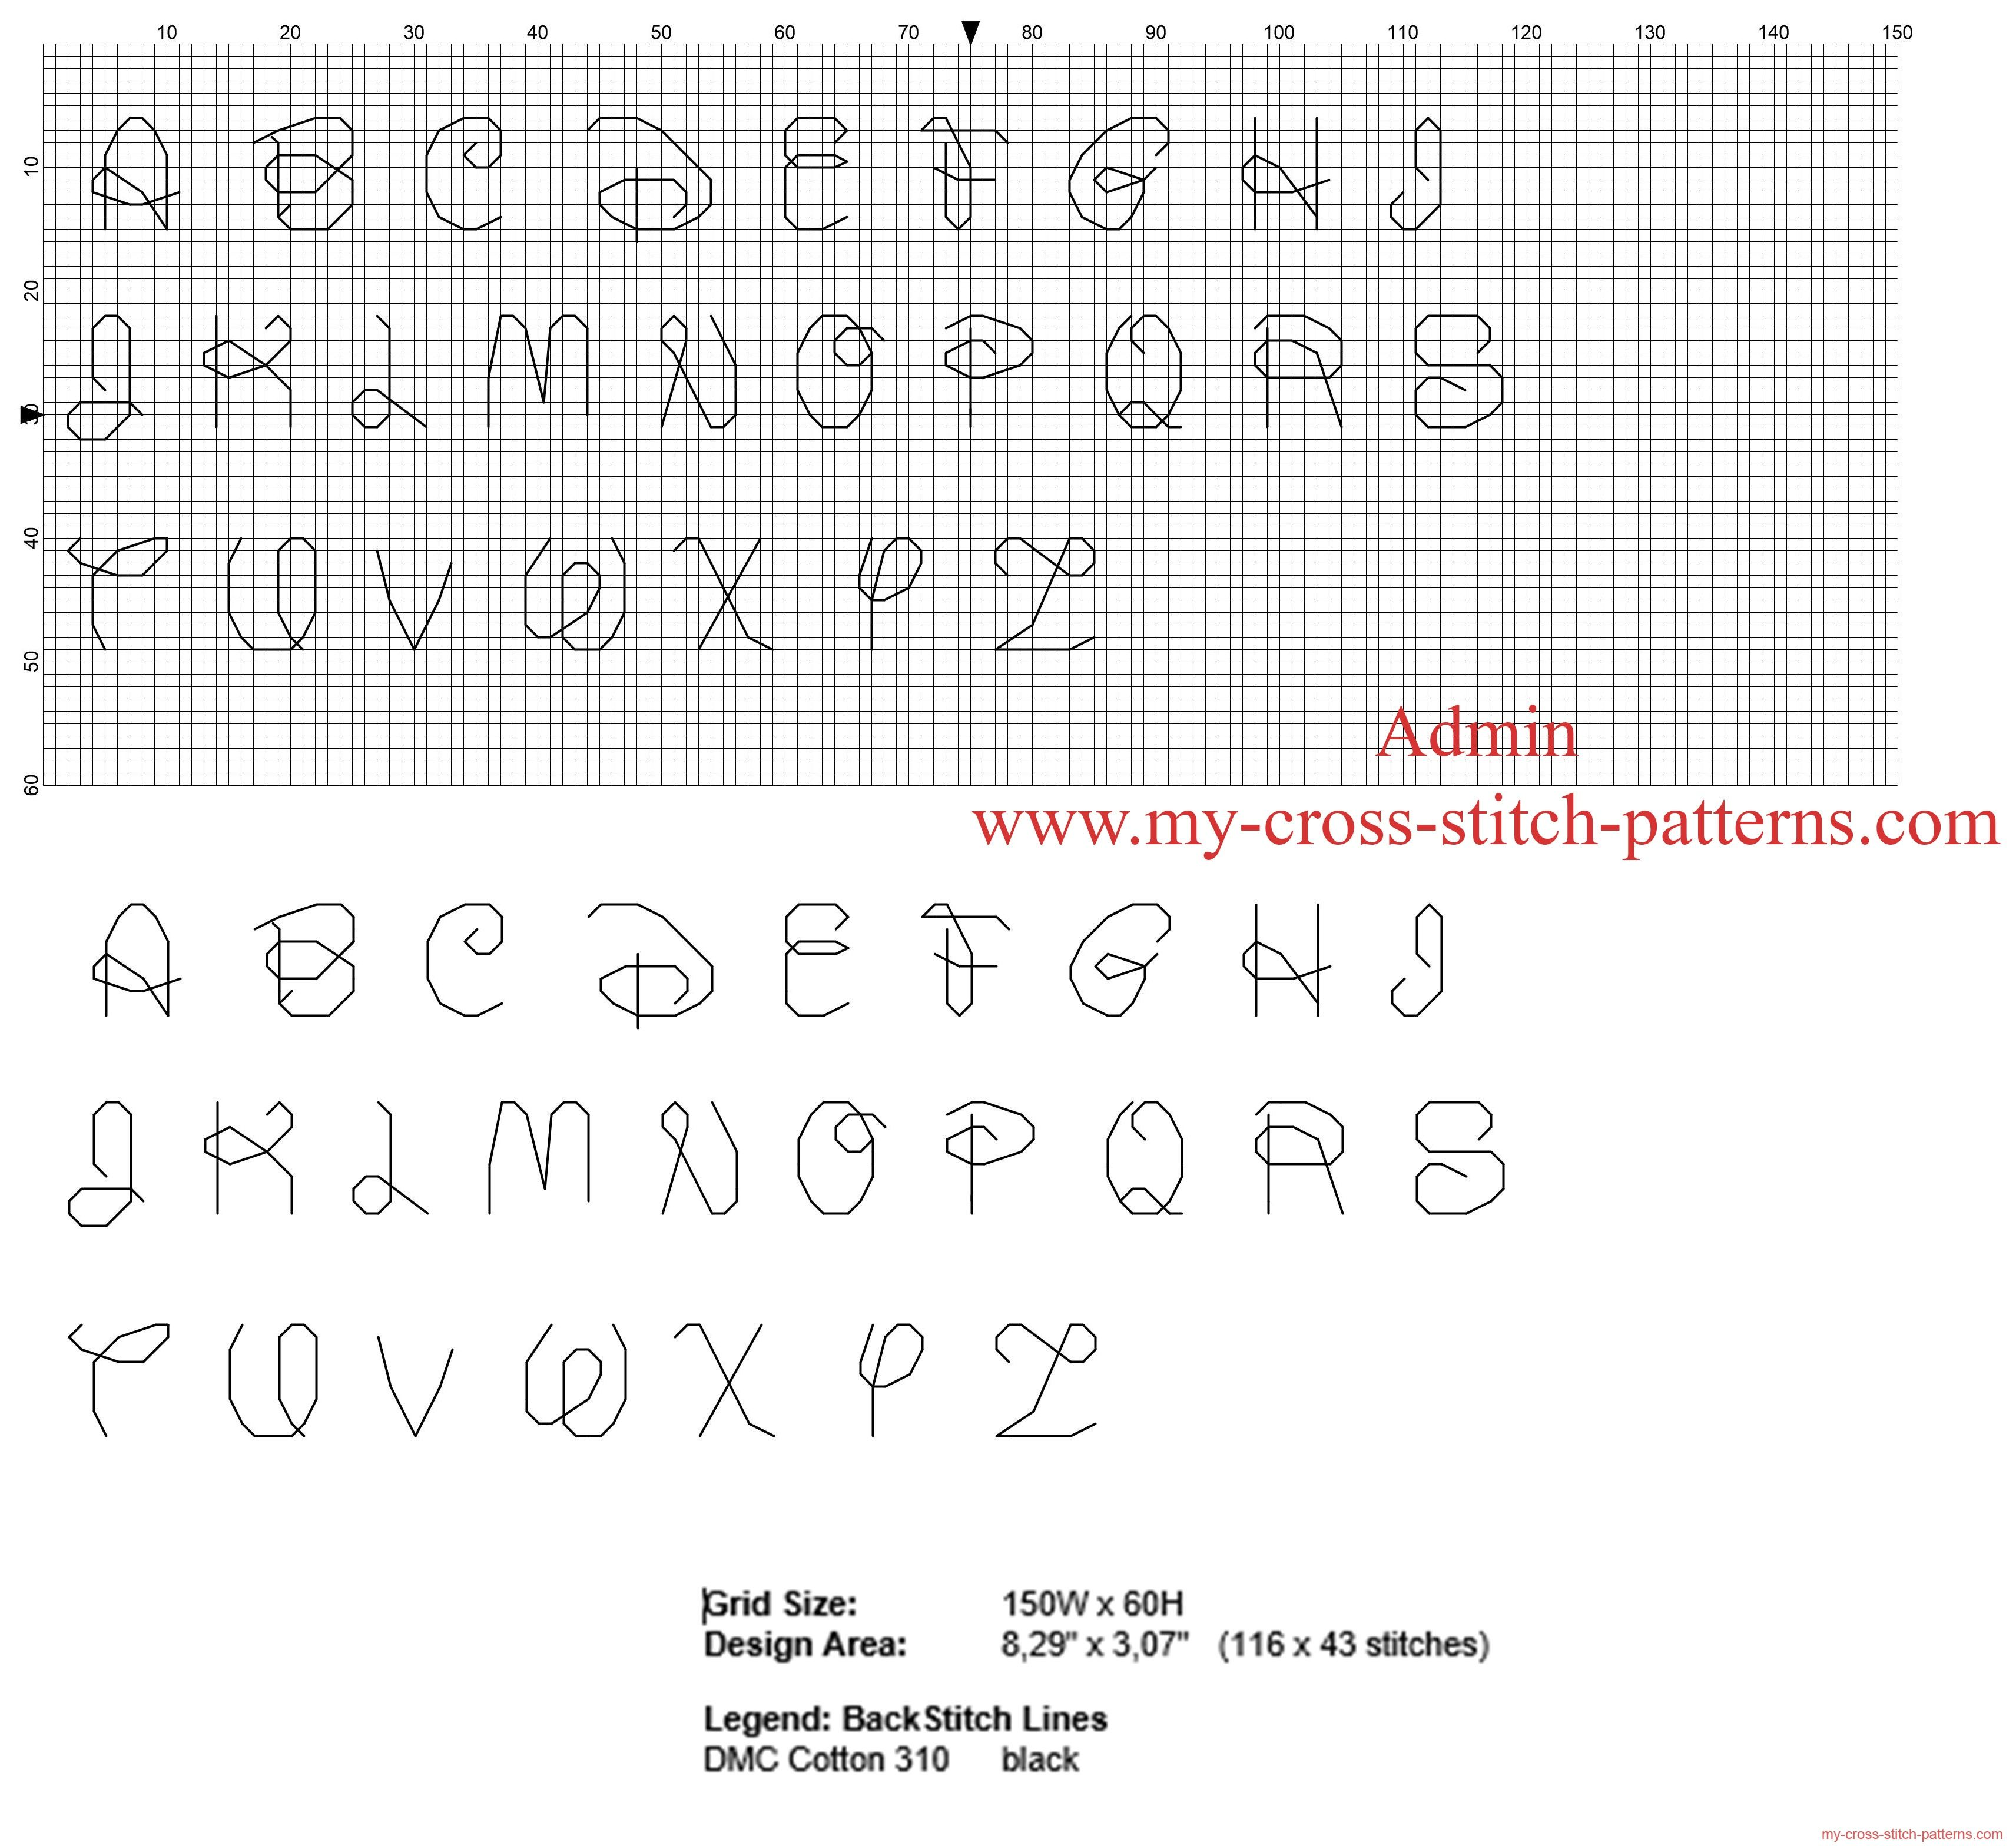 Abecedario punto de cruz font Disney cada letra medir 10 x 10 puntos ...